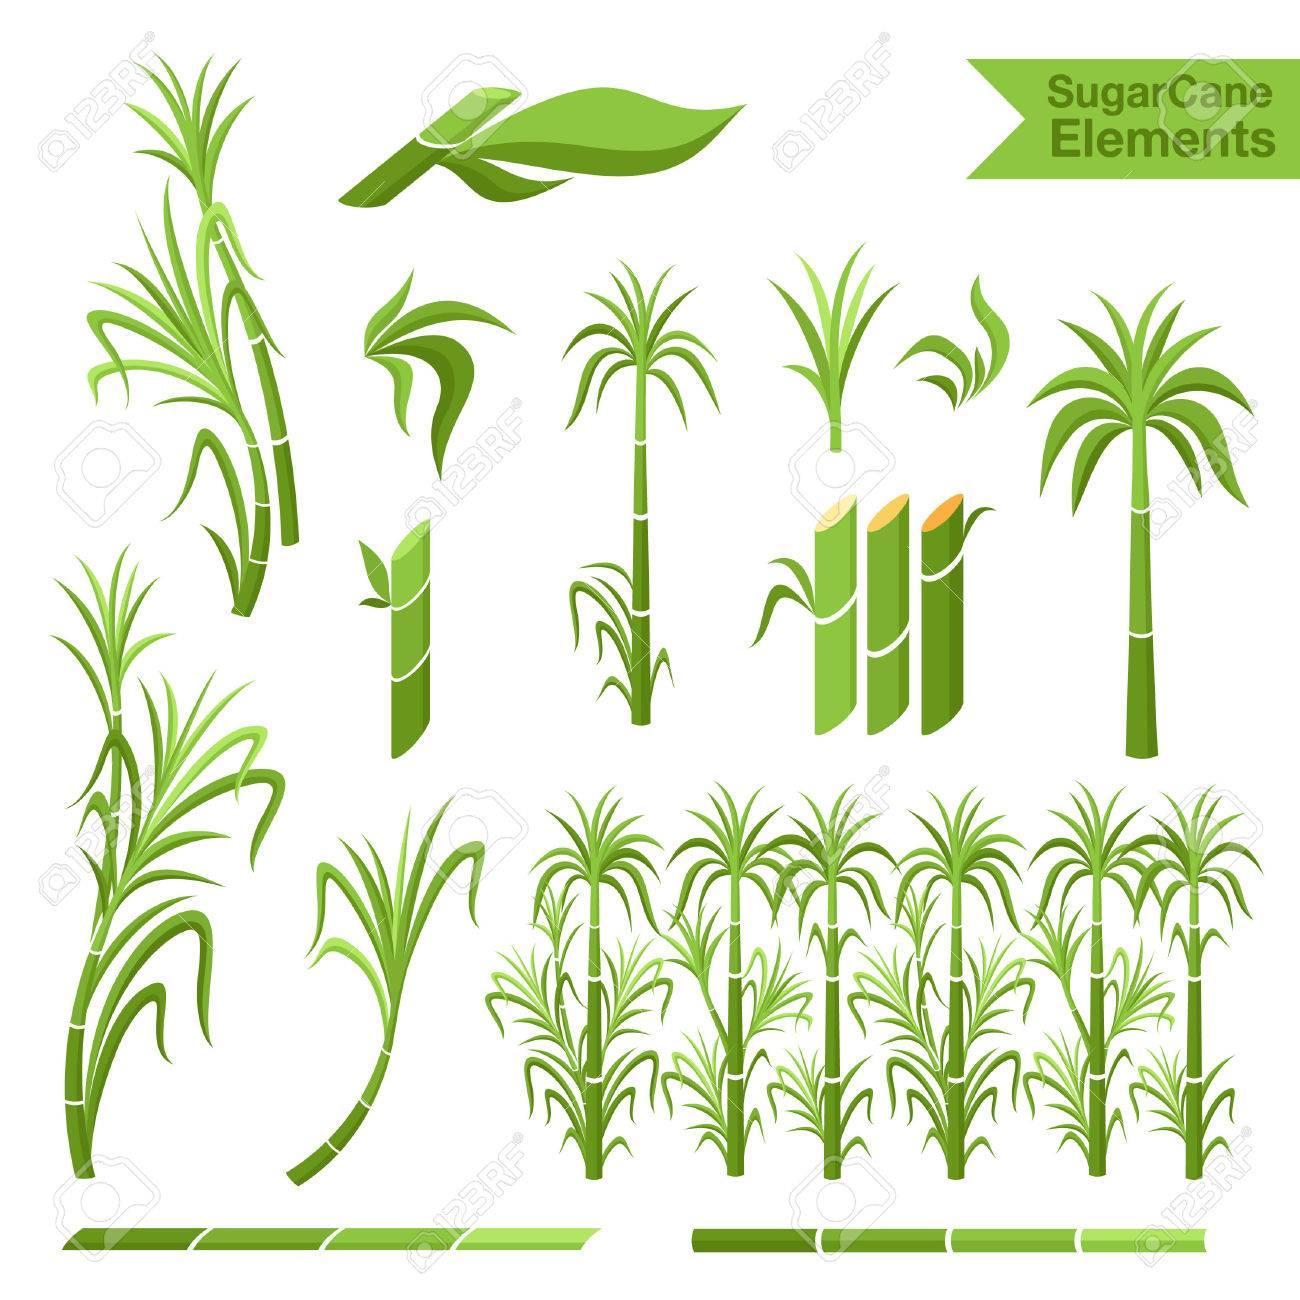 Sugar cane decoration elements. Collection of elemnts for design, - 62600934